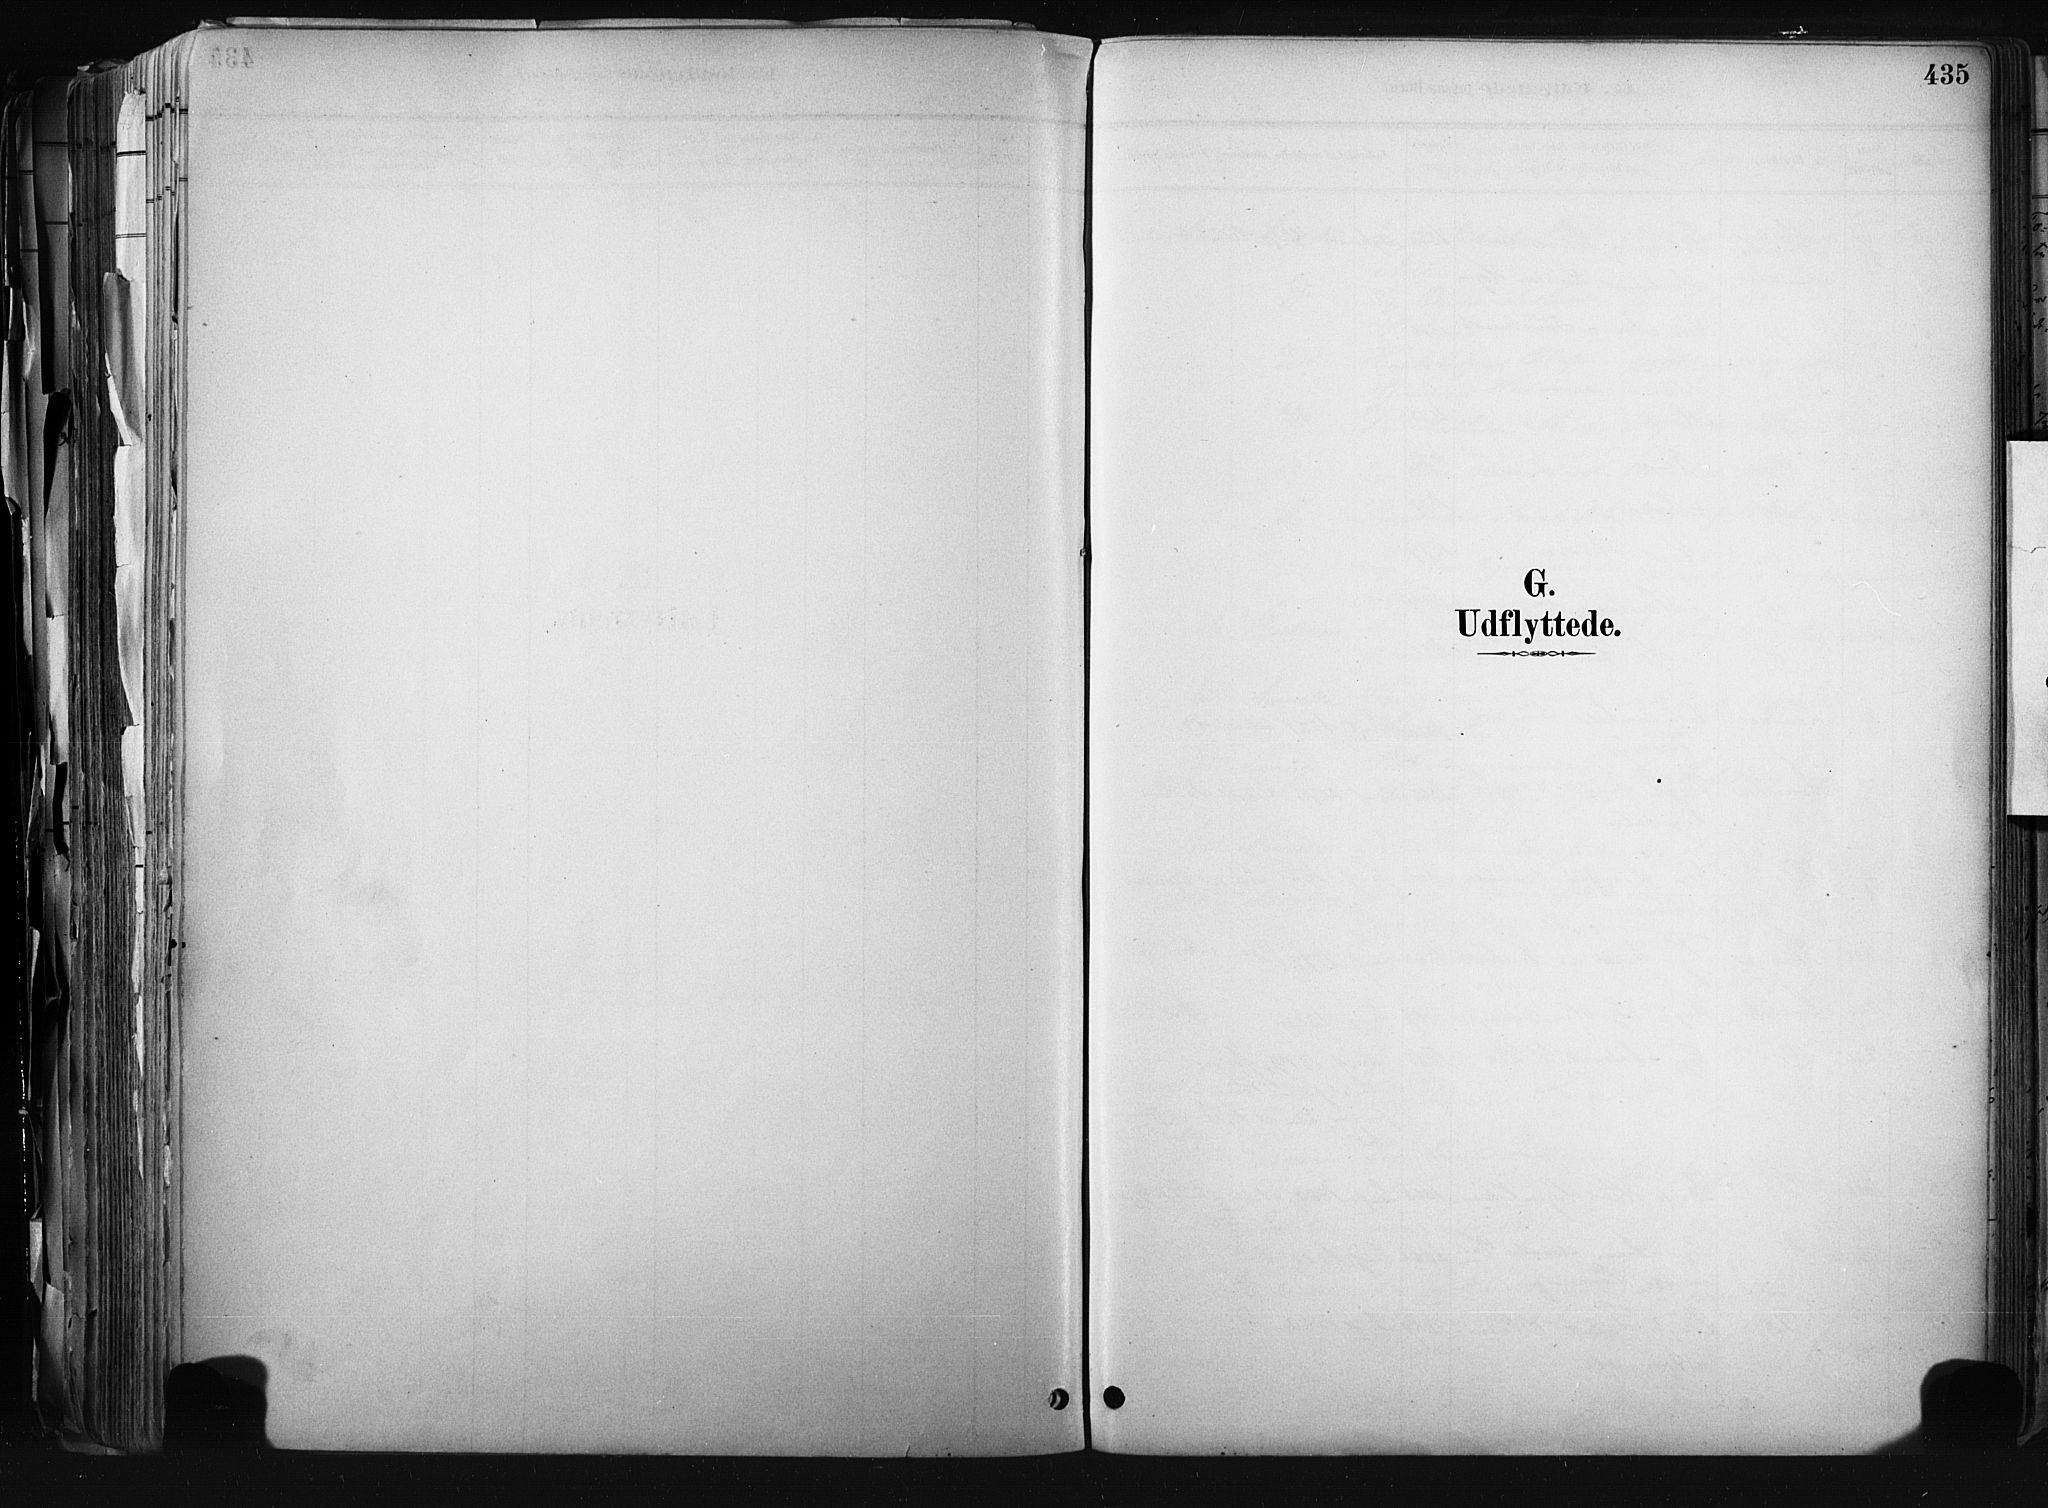 SAKO, Kongsberg kirkebøker, F/Fb/L0002: Parish register (official) no. II 2, 1886-1896, p. 435